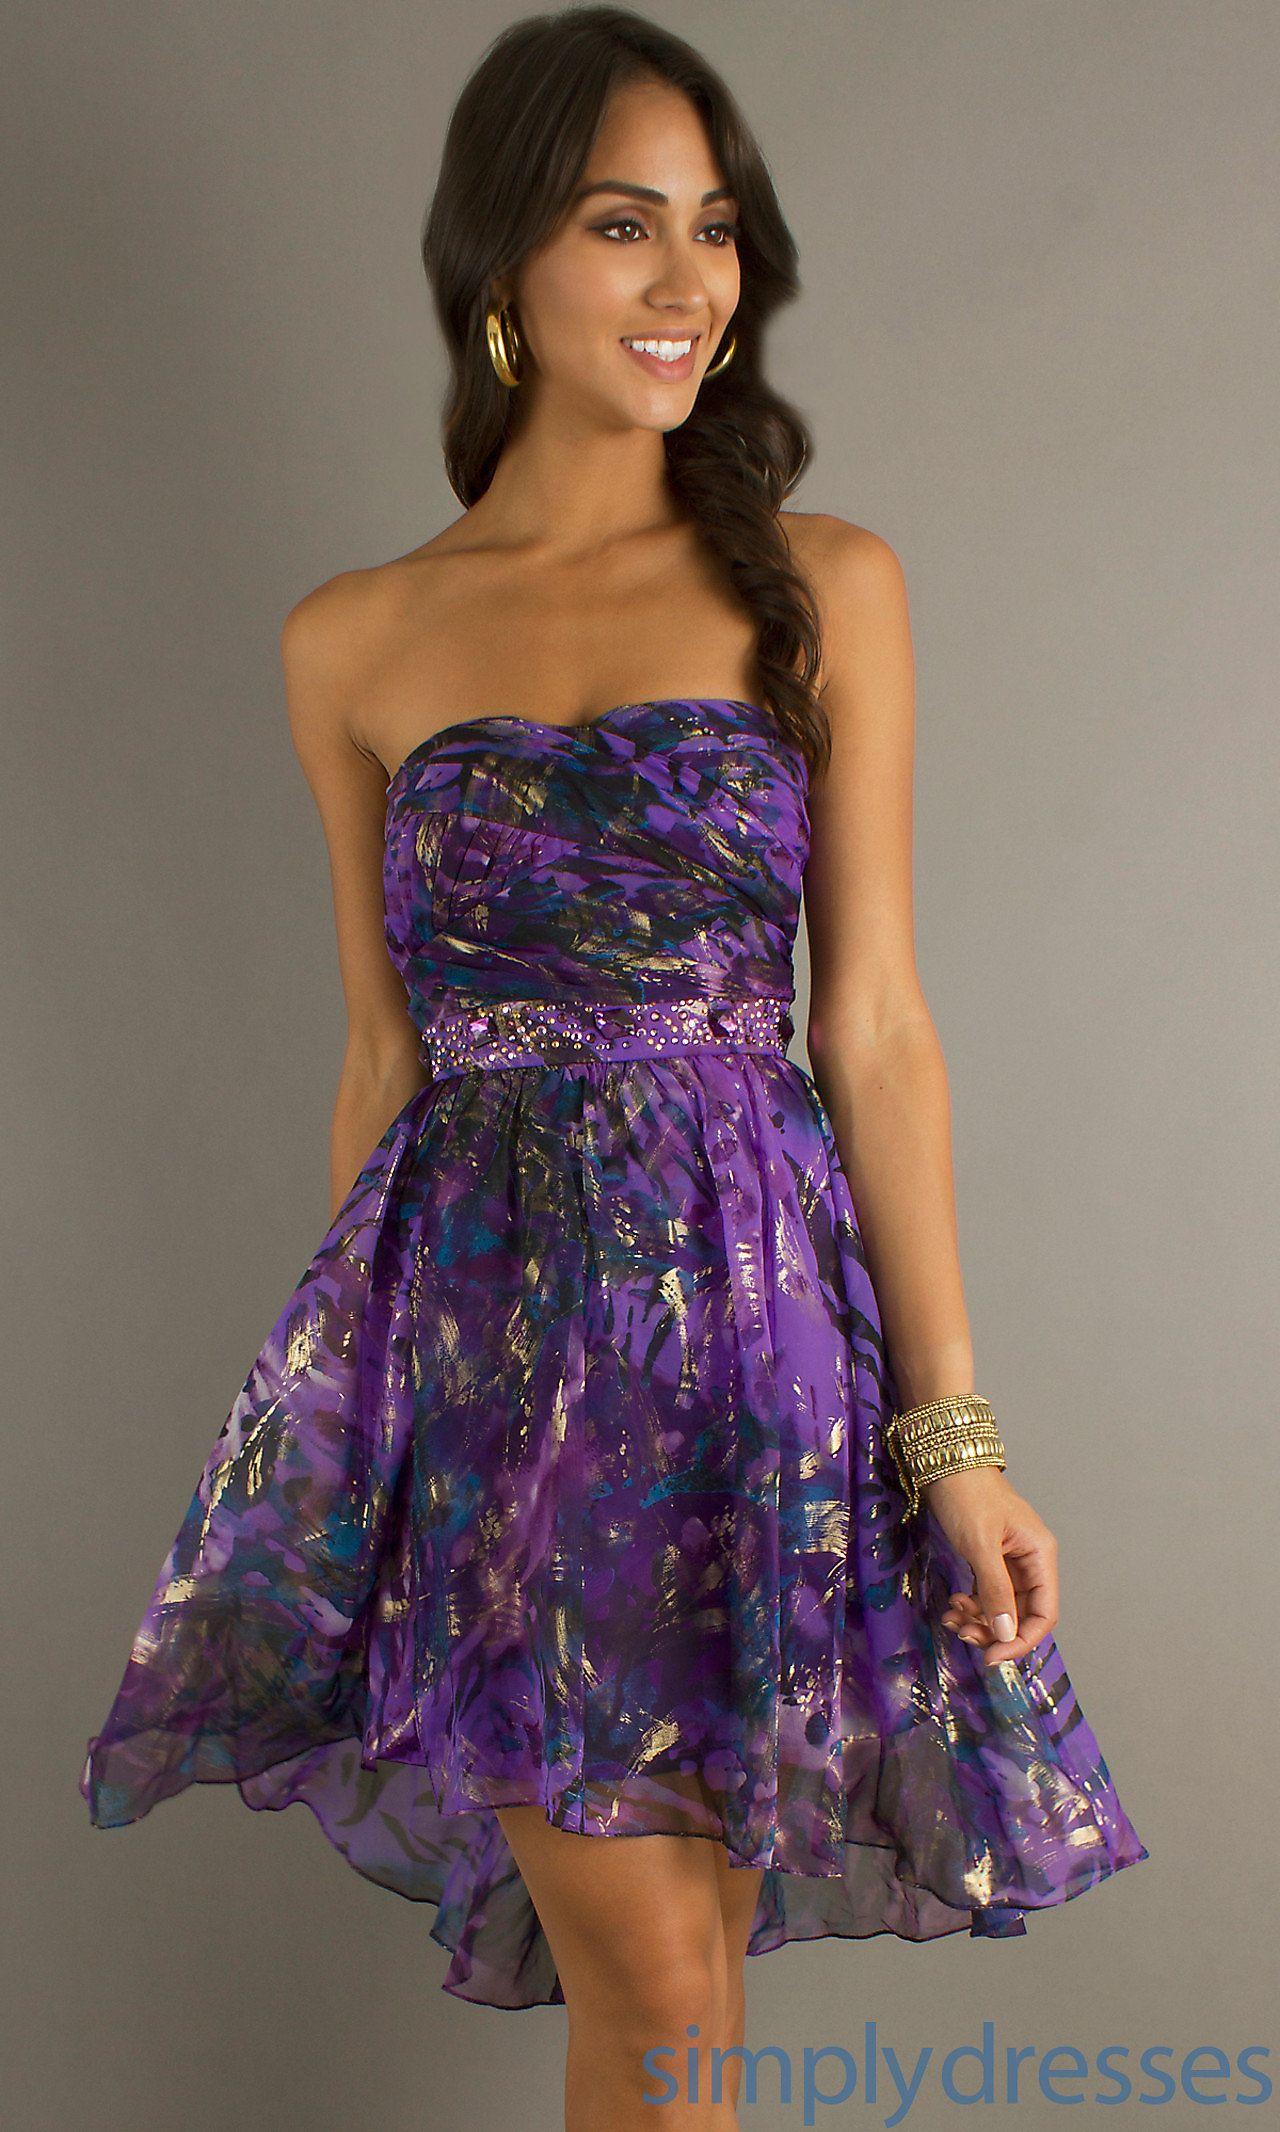 Short strapless purple multi high low dress ju dress me up